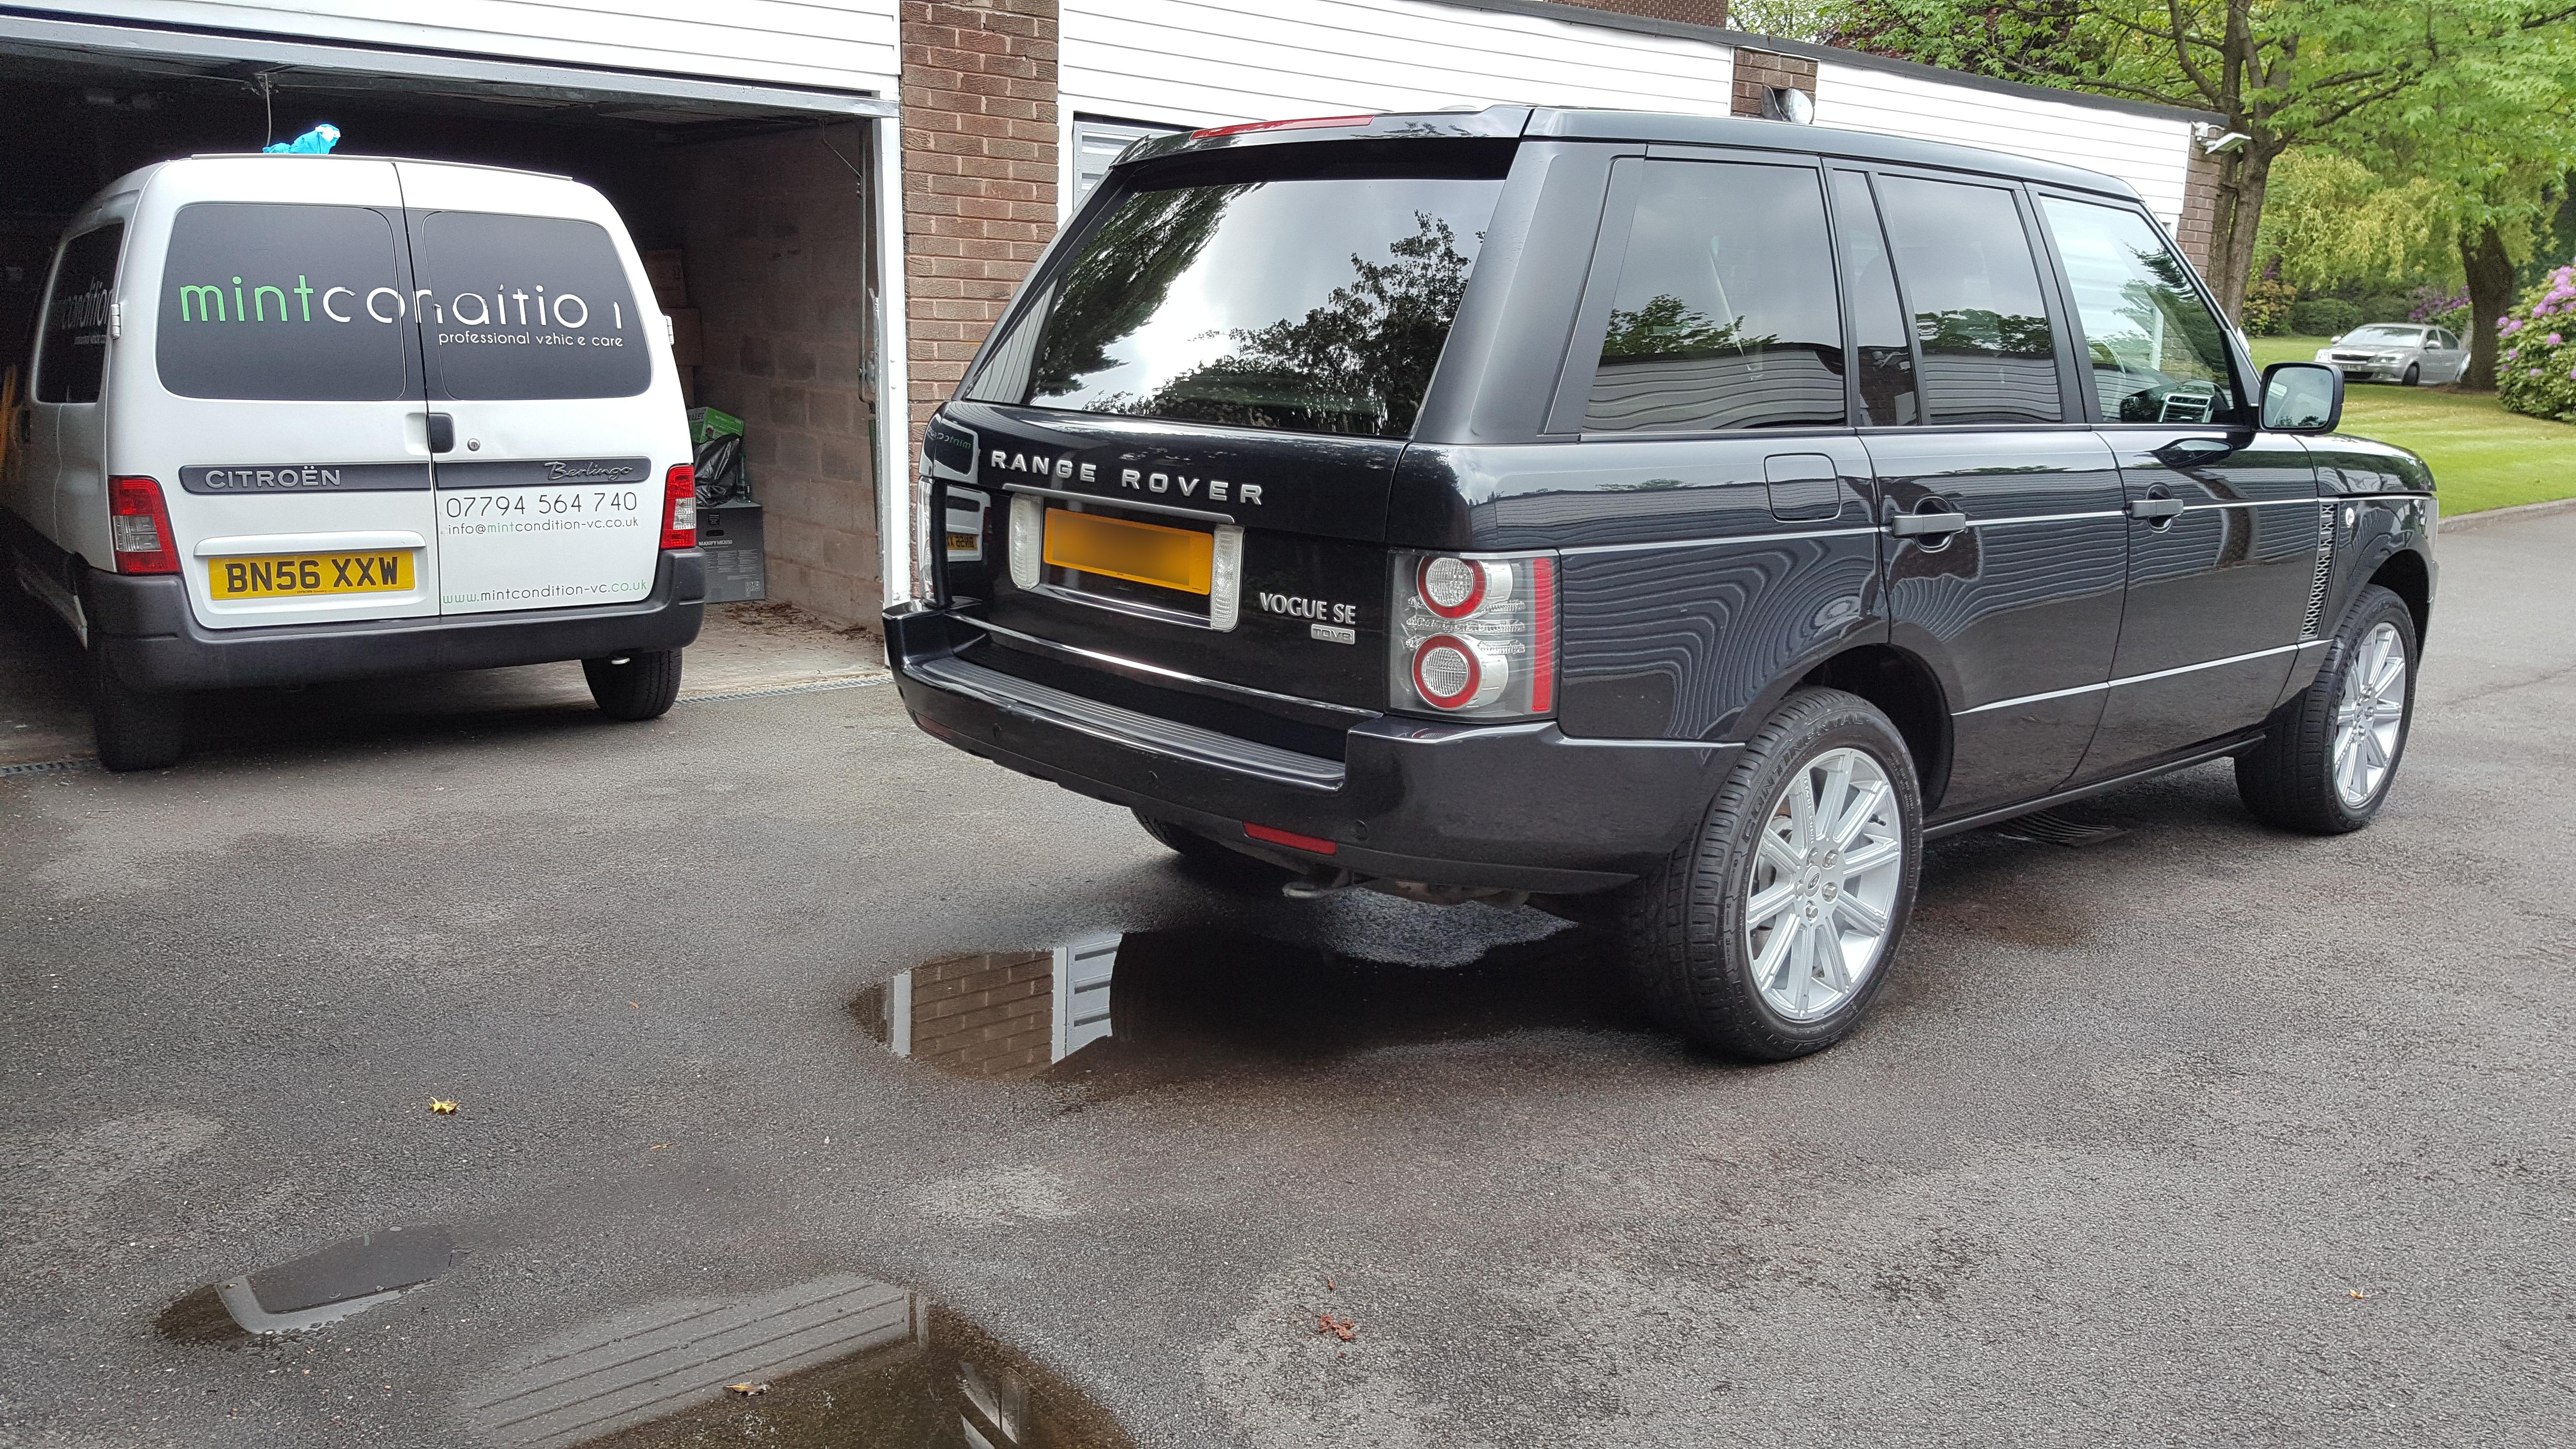 Car valeting, mobile valeting, mobile car valeting, mobile car valeting Birmingham